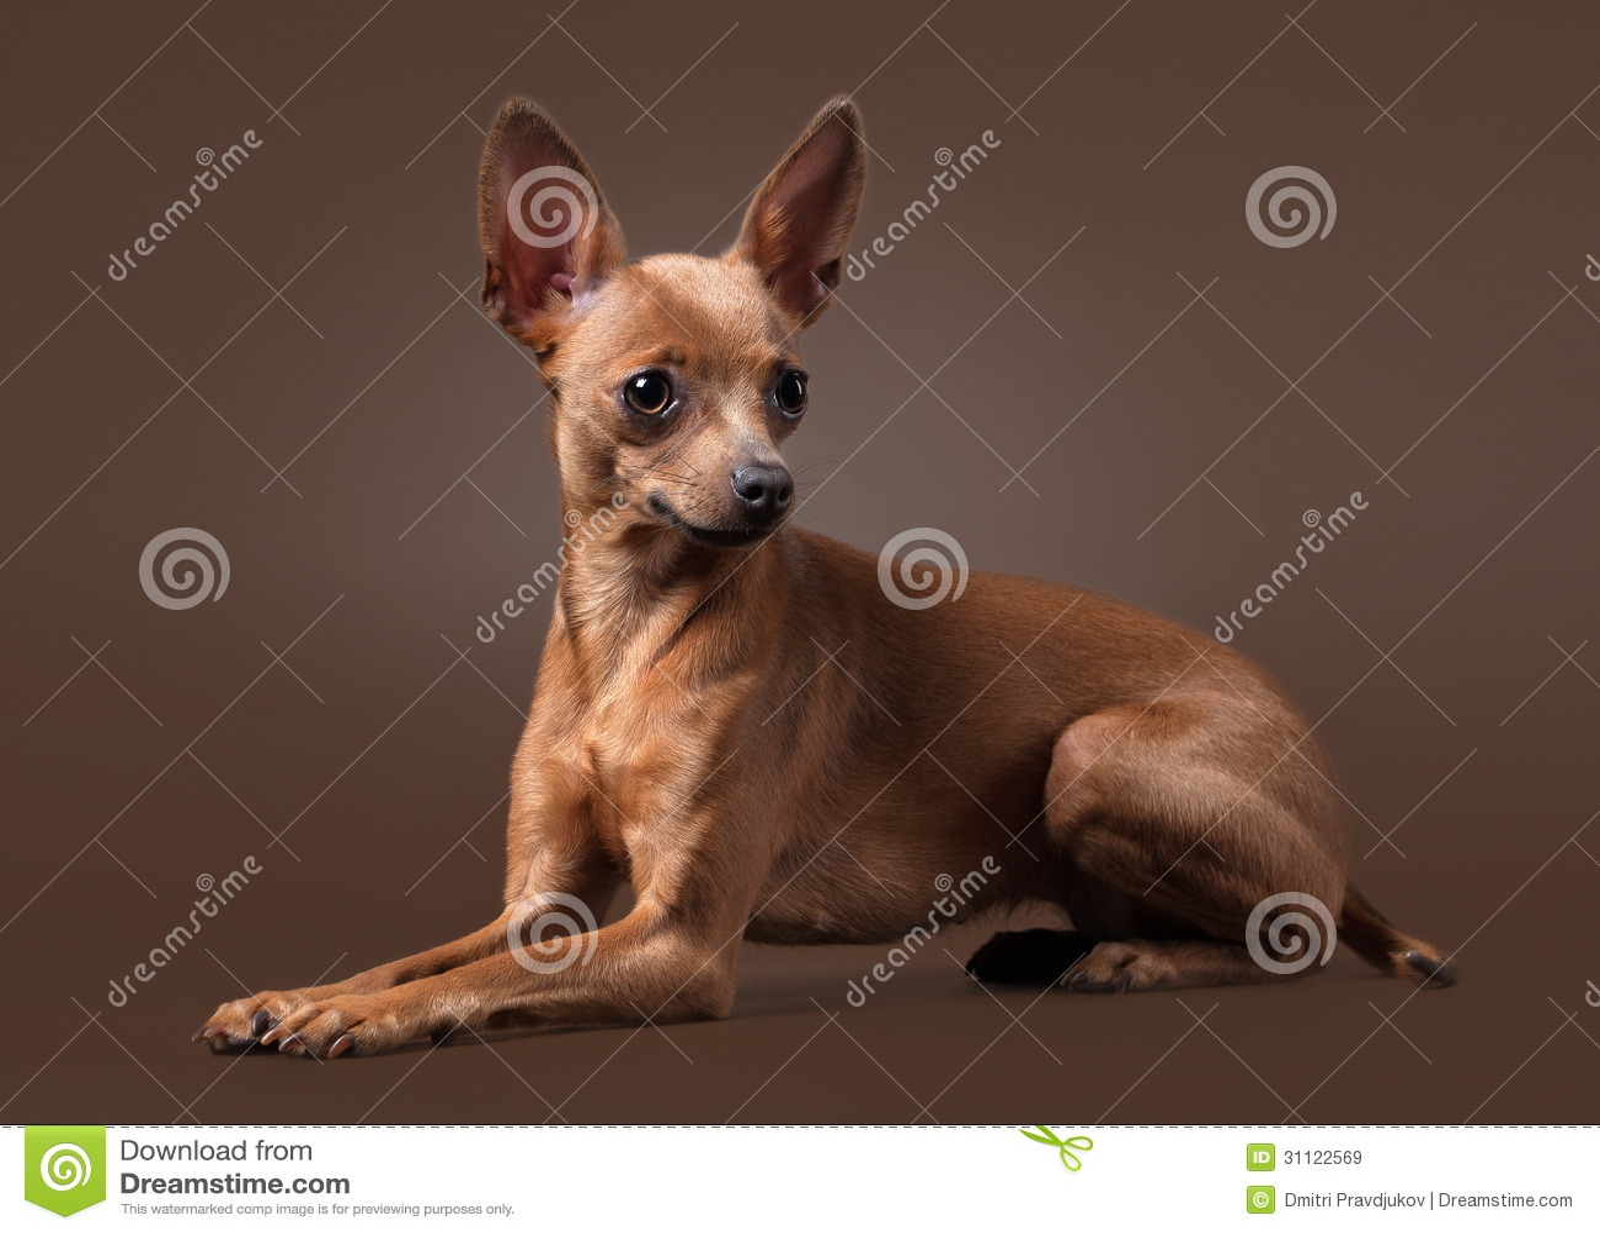 İngiliz Toy Terrier